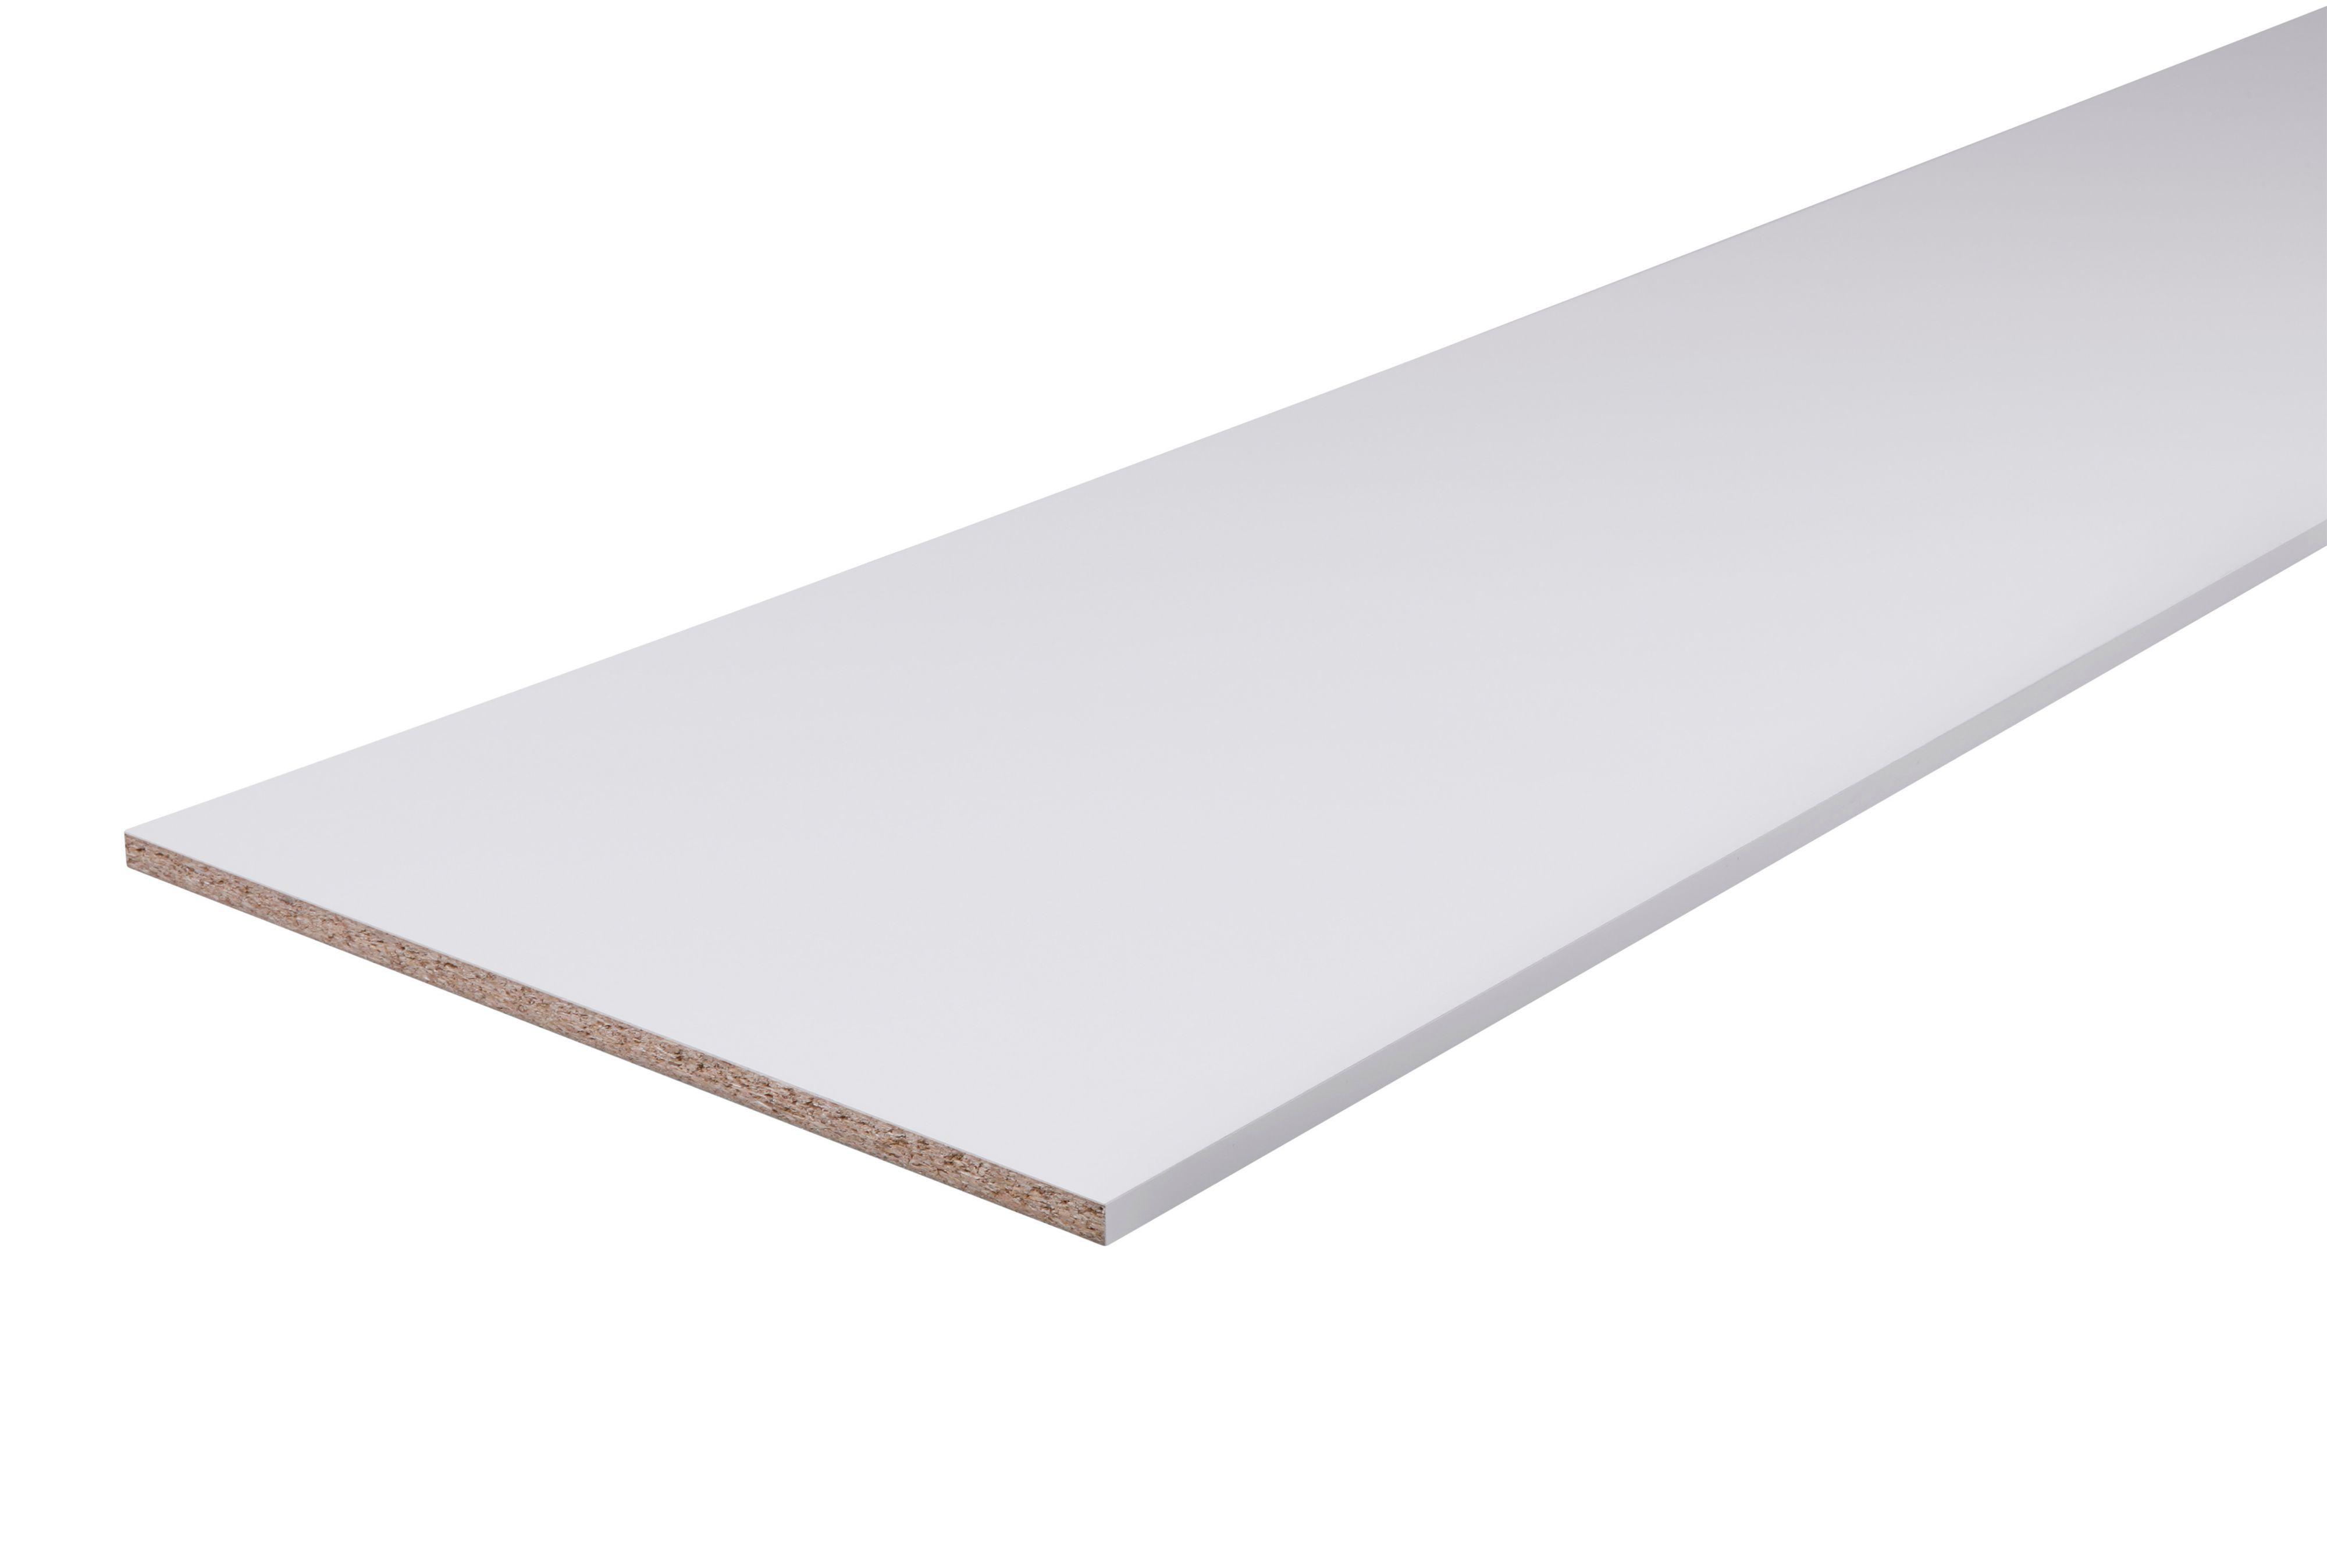 Chipboard White Furniture Board L 2500mm W 500mm T 18mm